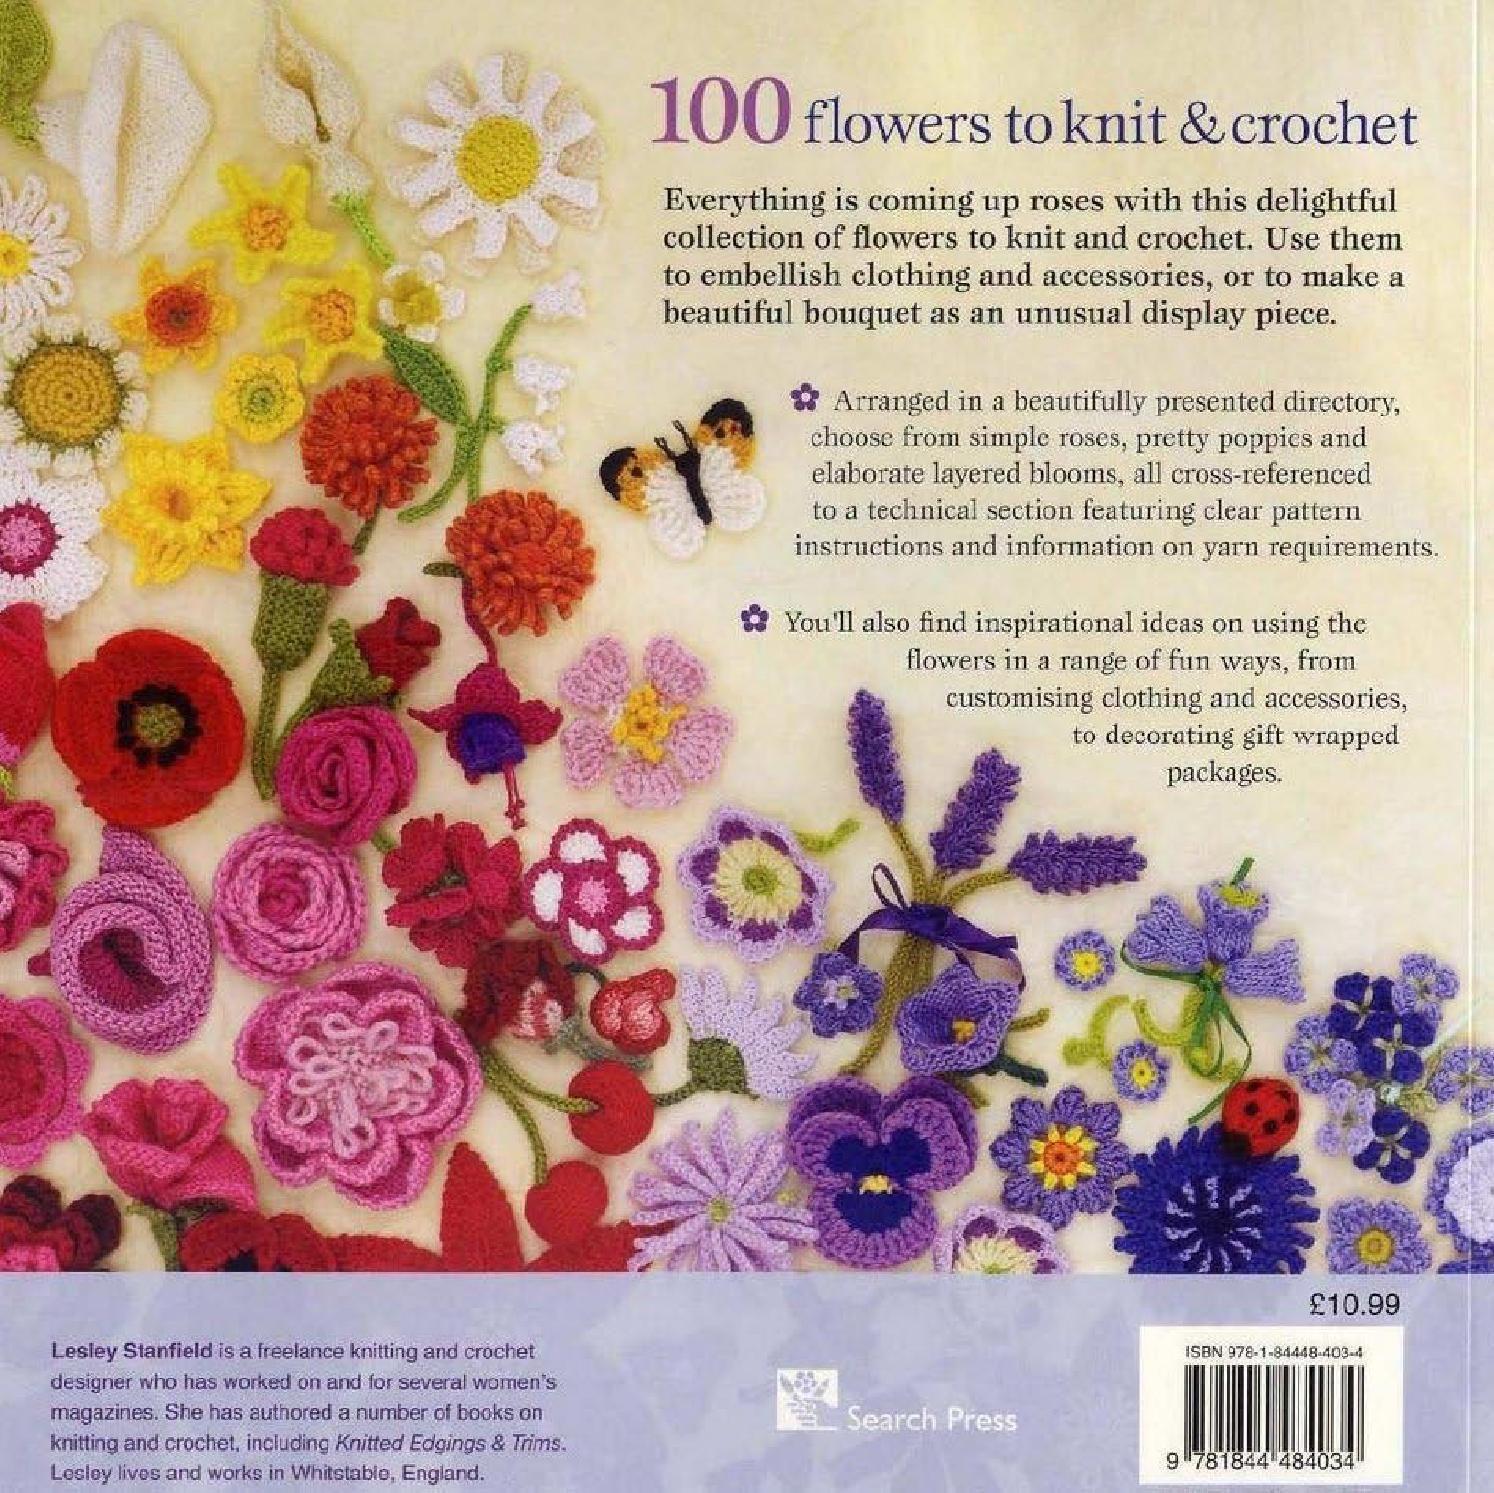 100 Flowers To Knit Crochet 2 Blumen Hakeln Hakeln Maschenhakeln